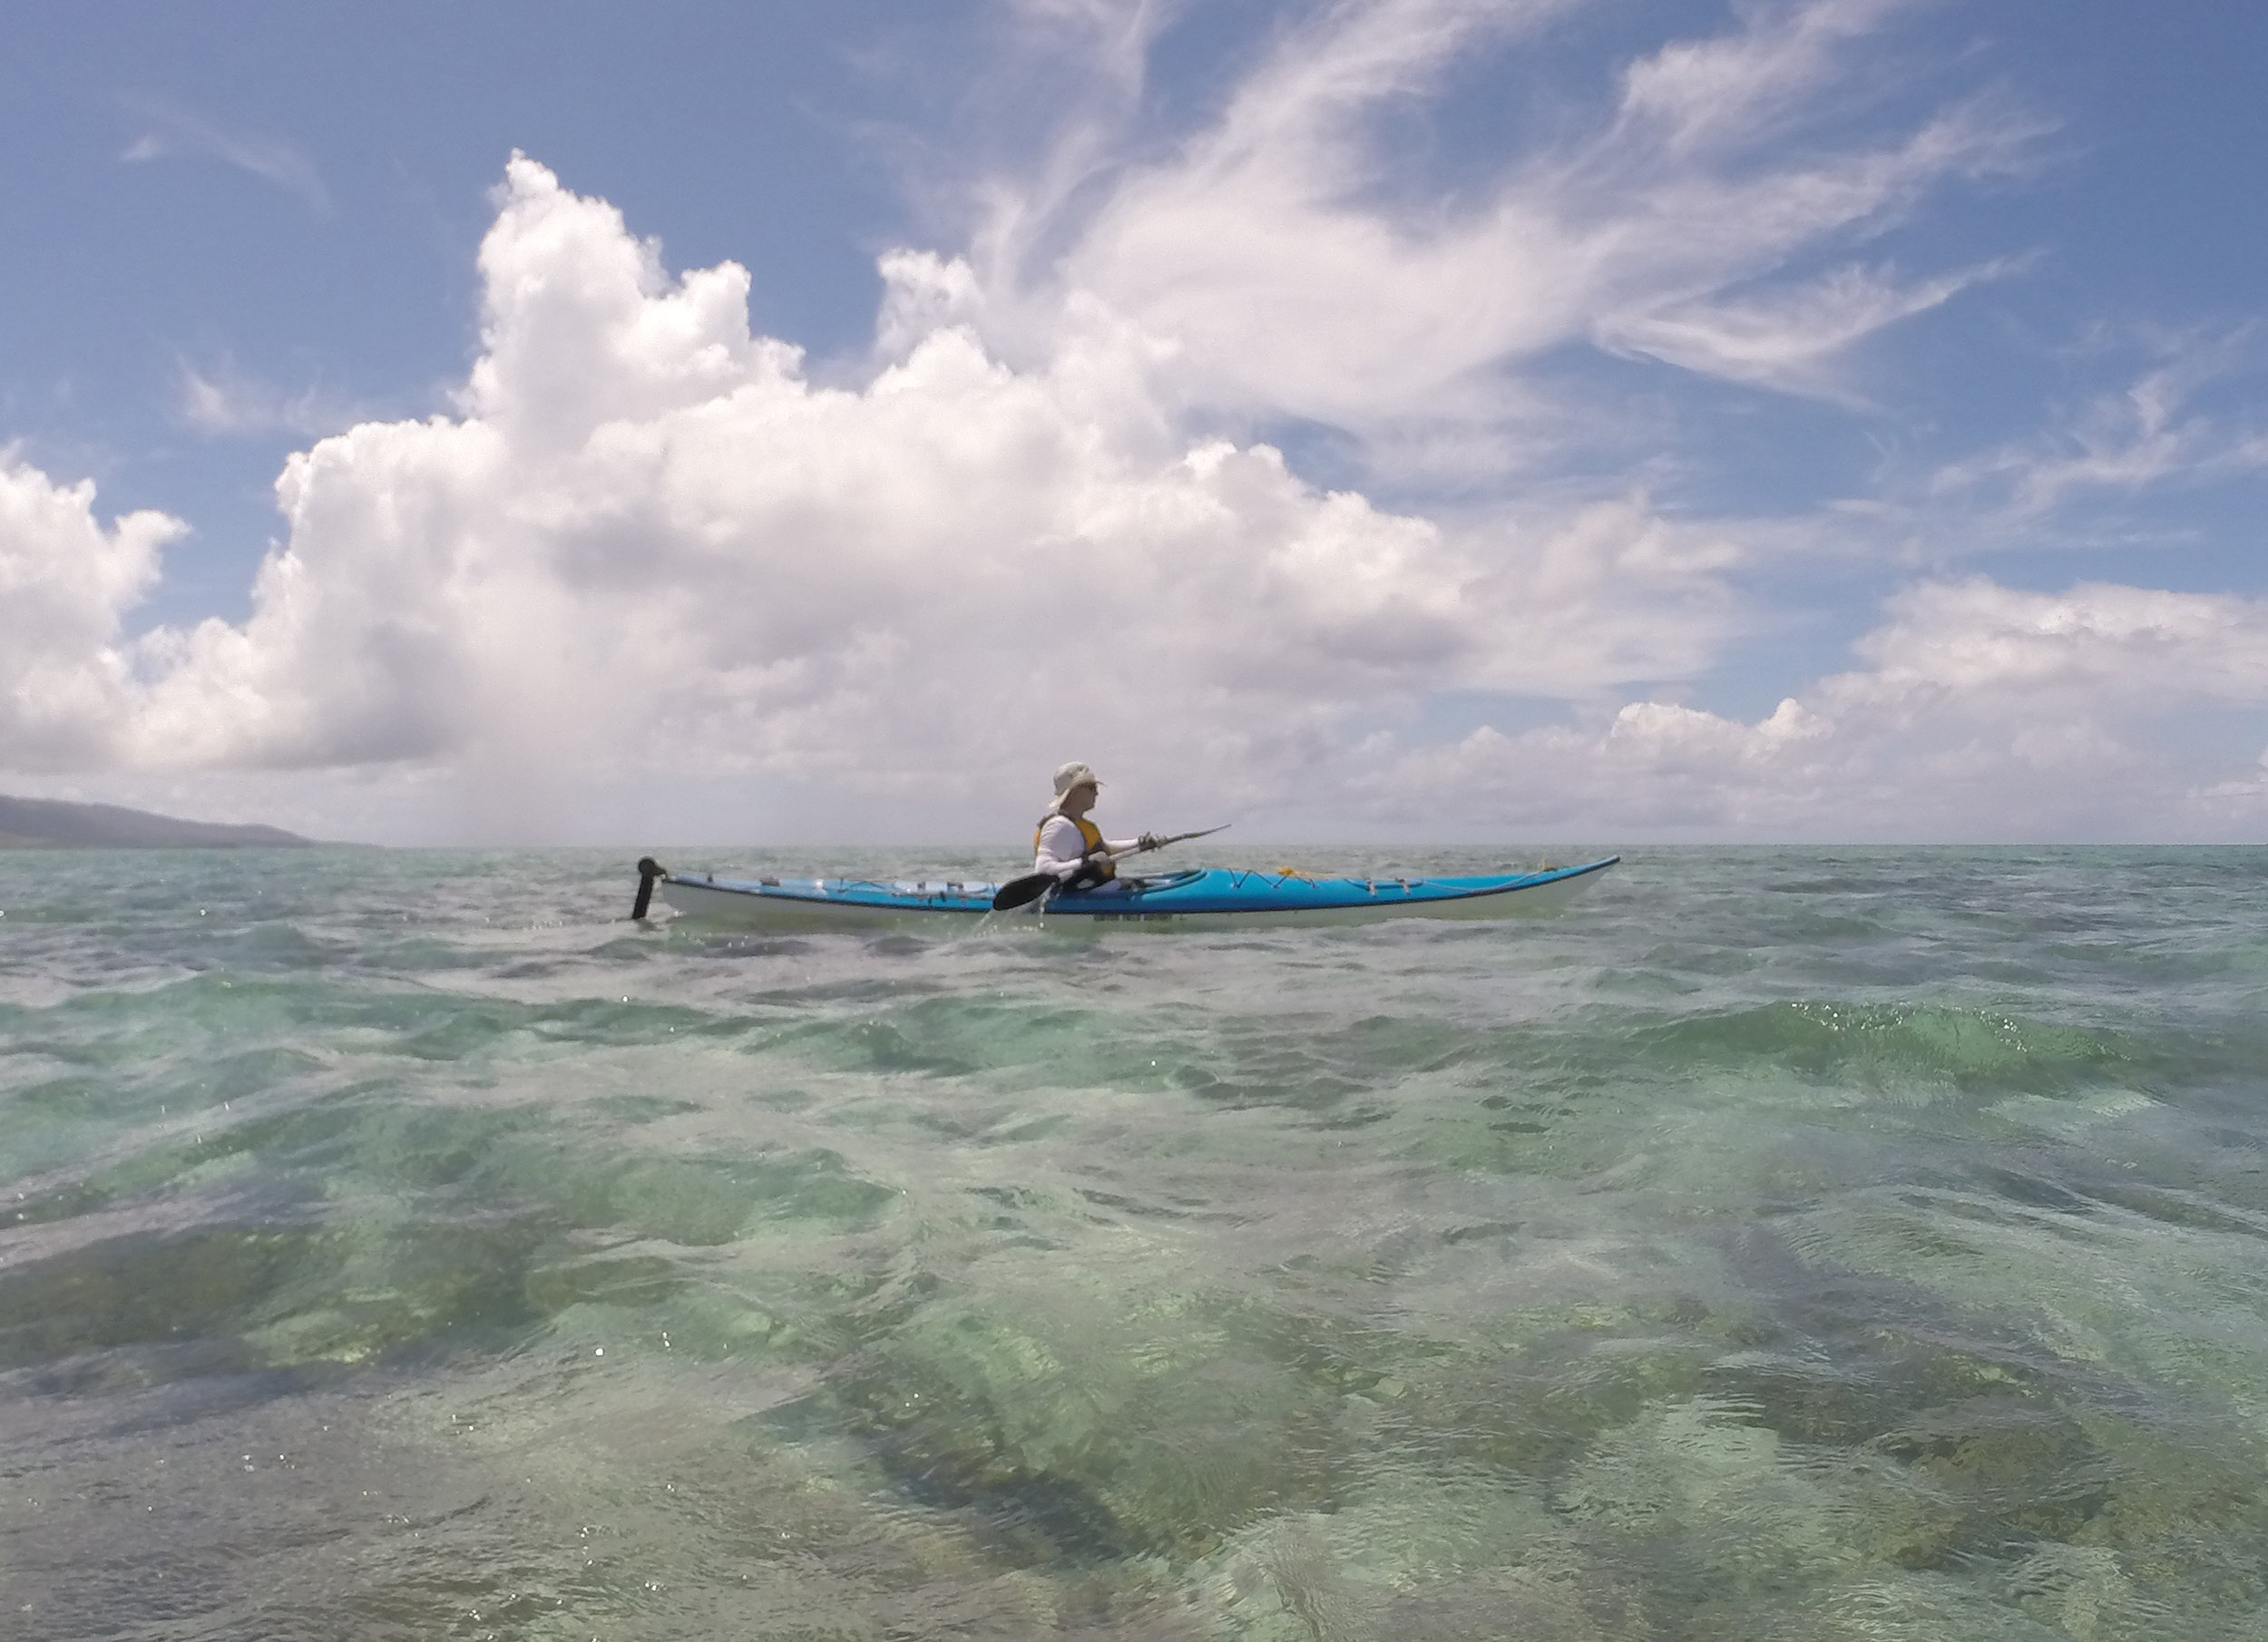 Kayaking in the Kohama sea